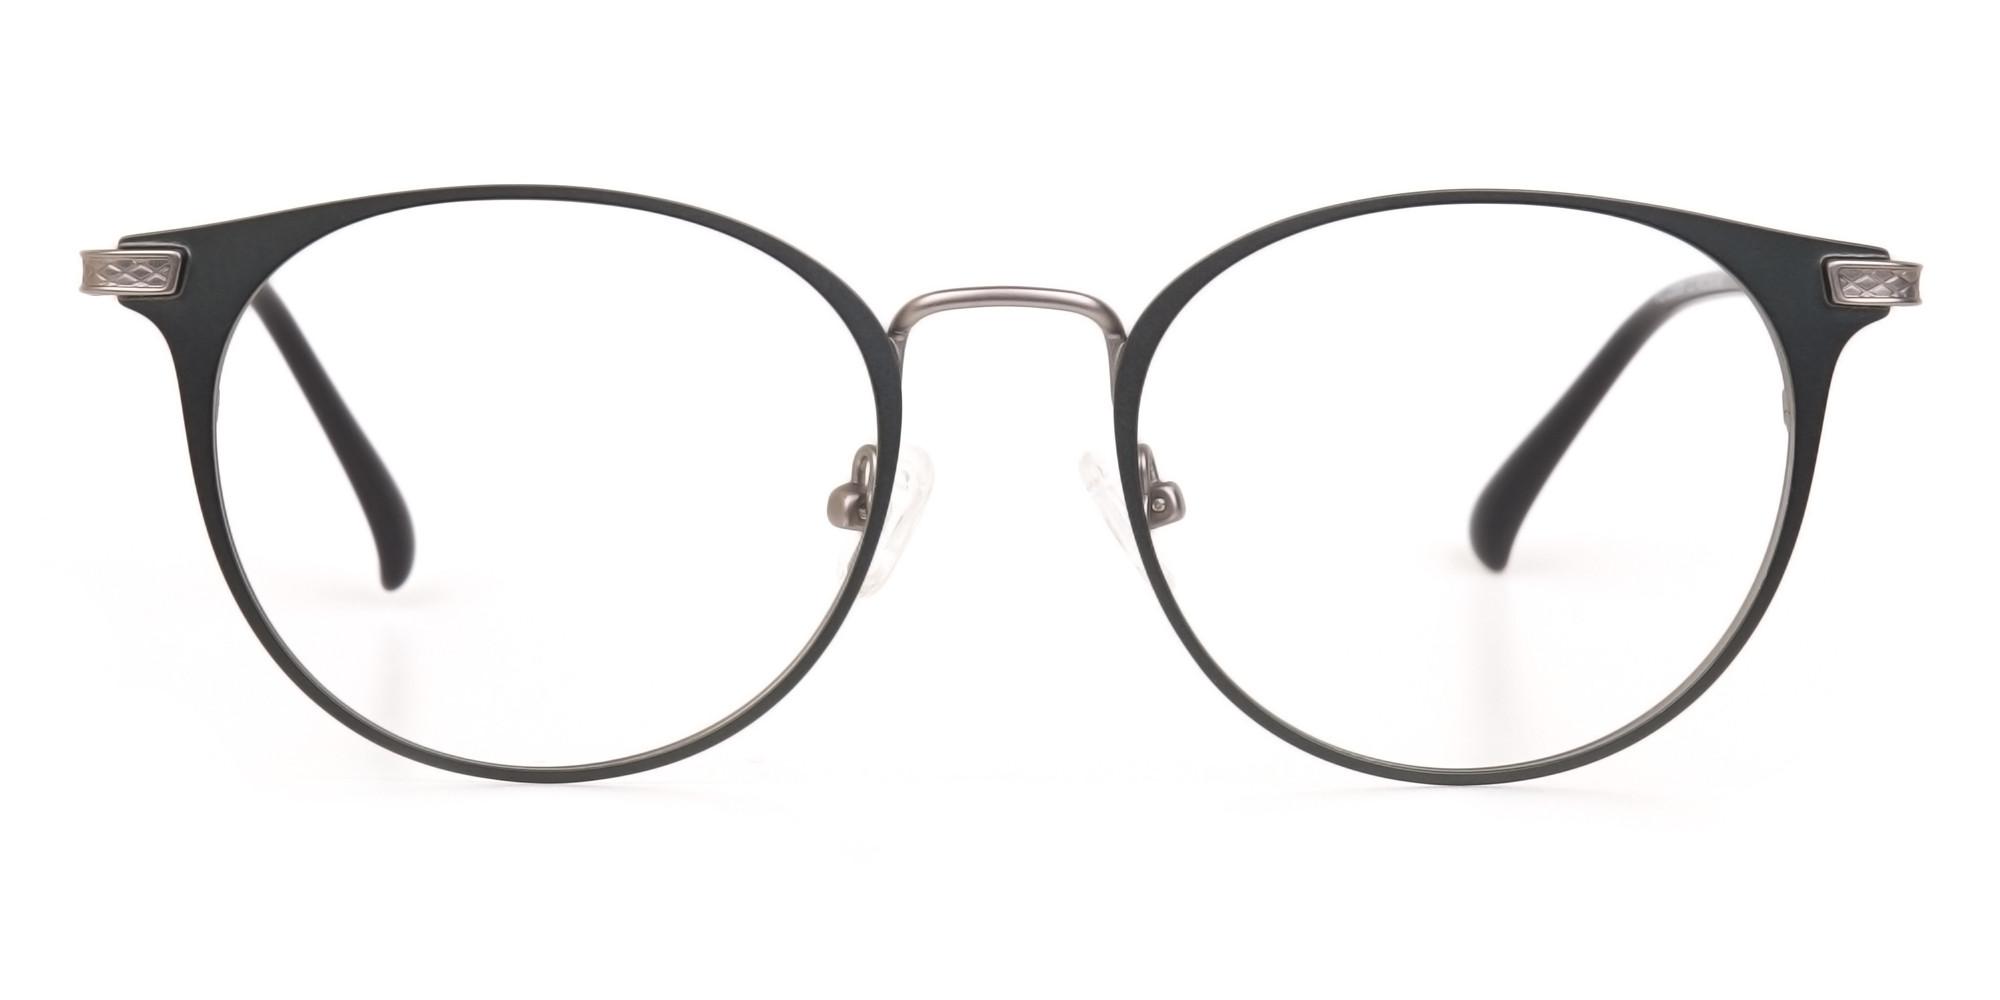 Matte Hunter Green Gunmetal Round Glasses Unisex -1